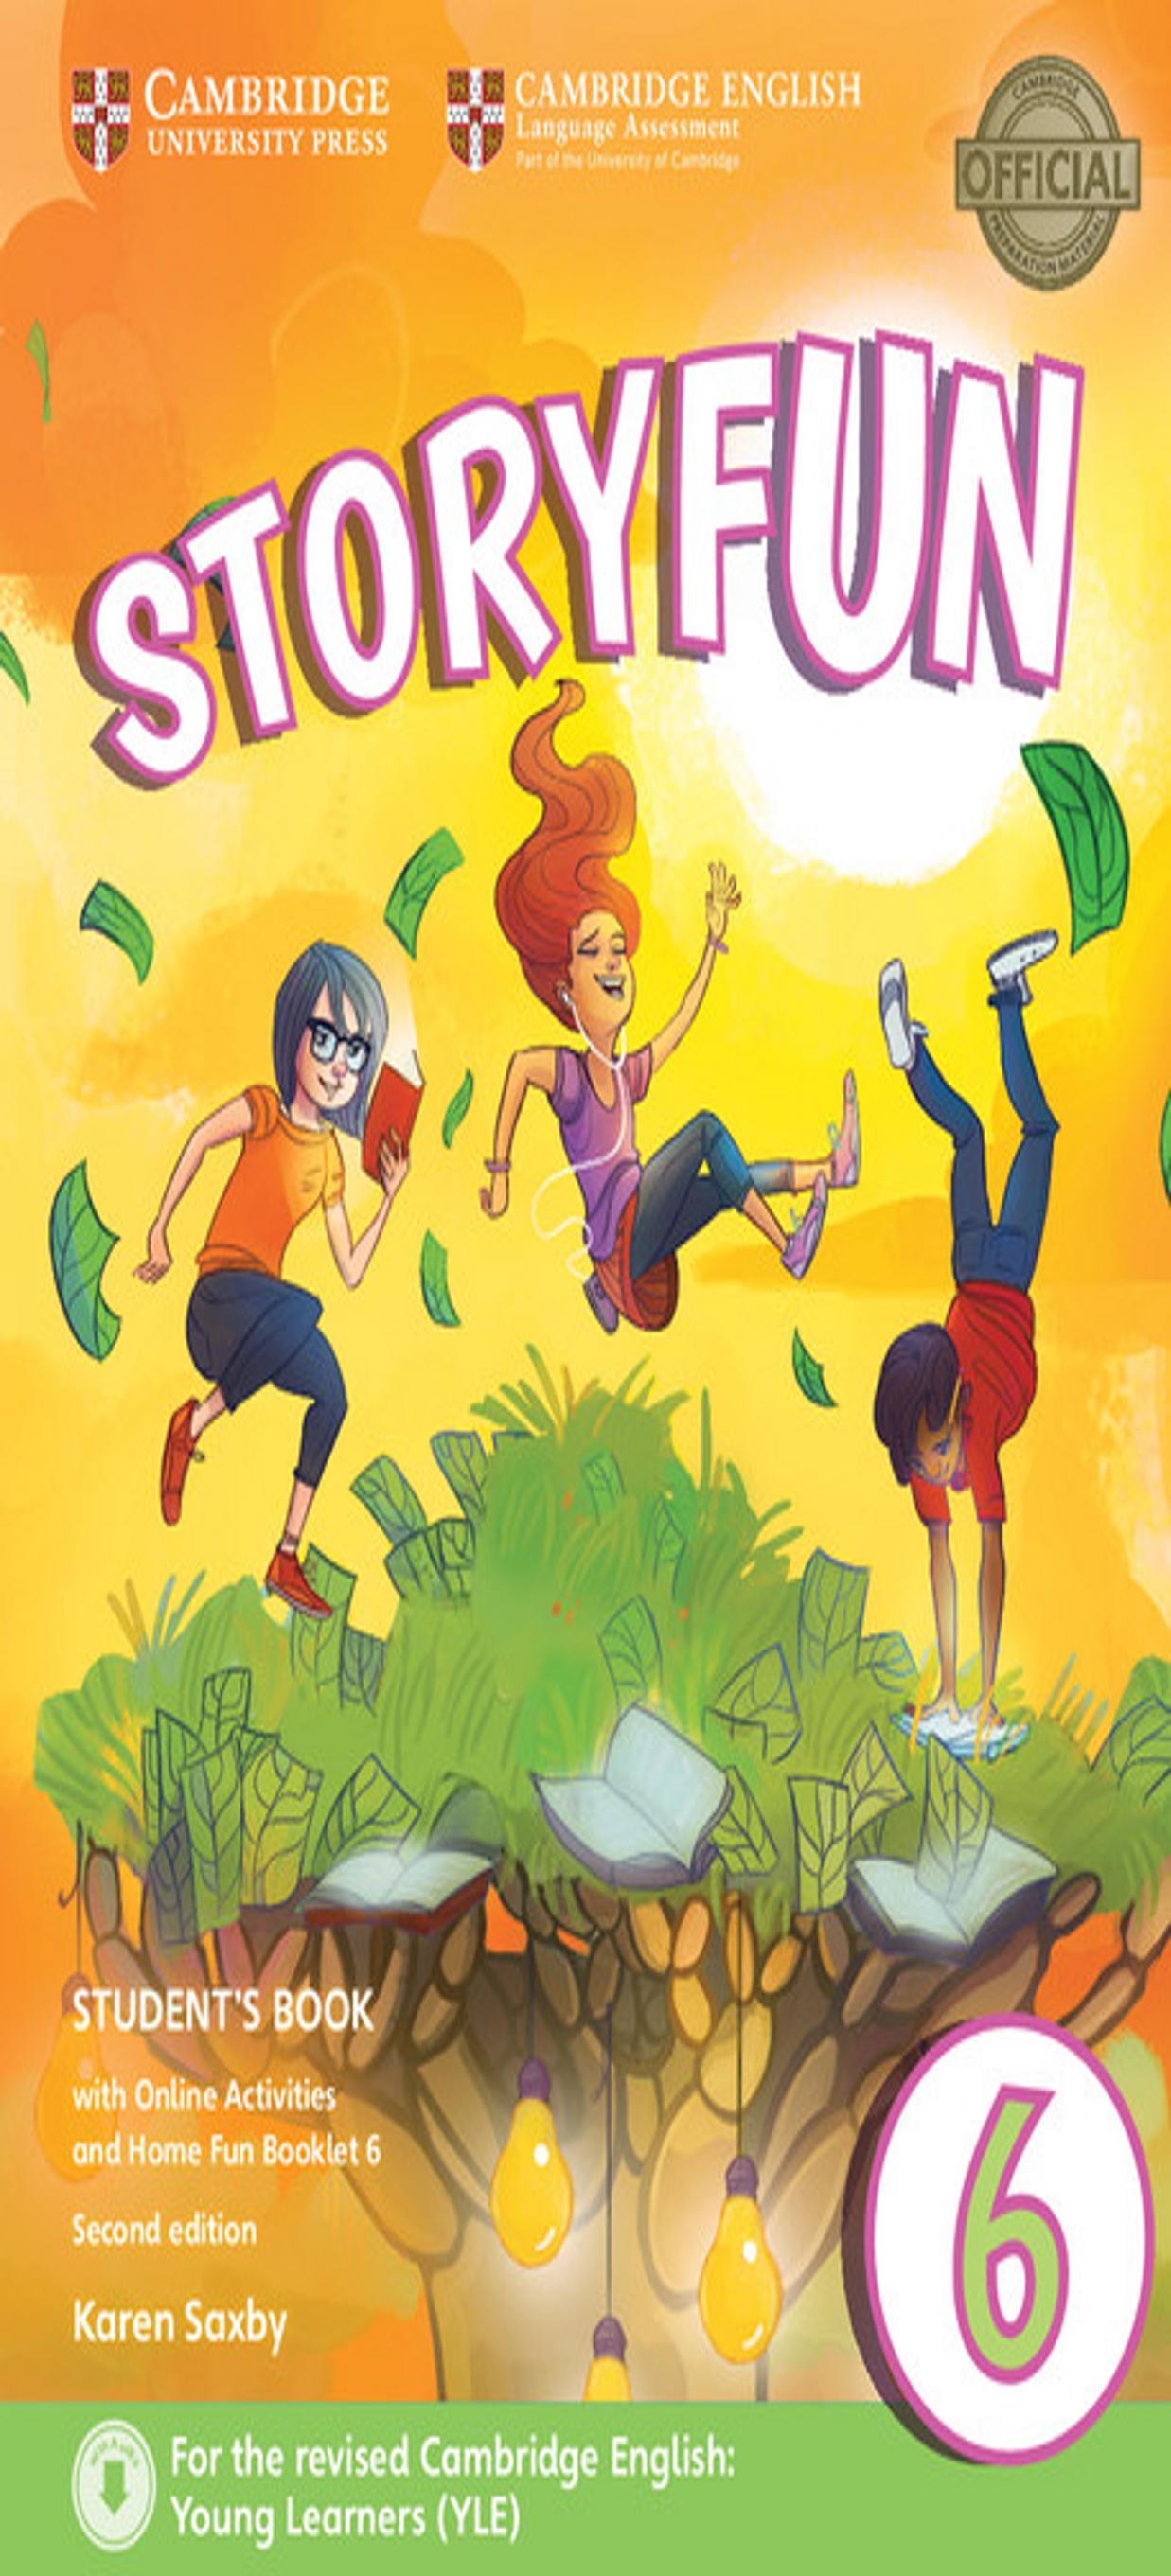 STORYFUN 6 SB + Online Activities + Home Fun Booklet 2nd Ed Revised